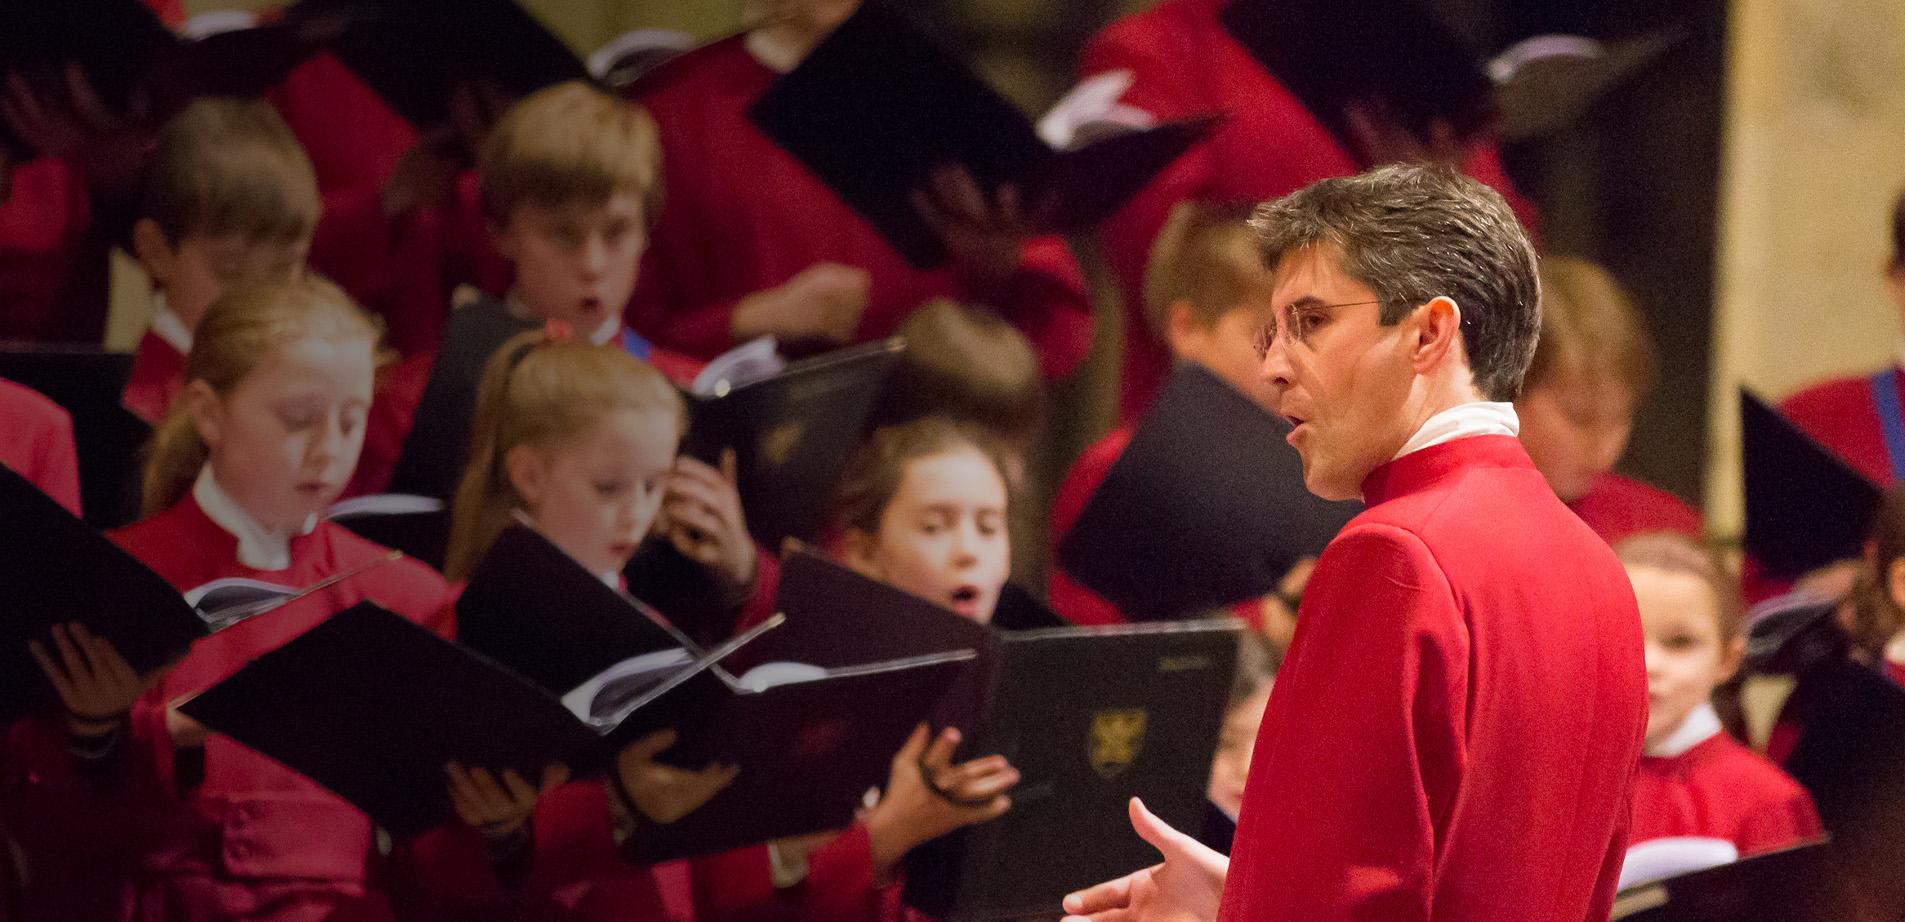 York Minster's Christmas Carol Concerts